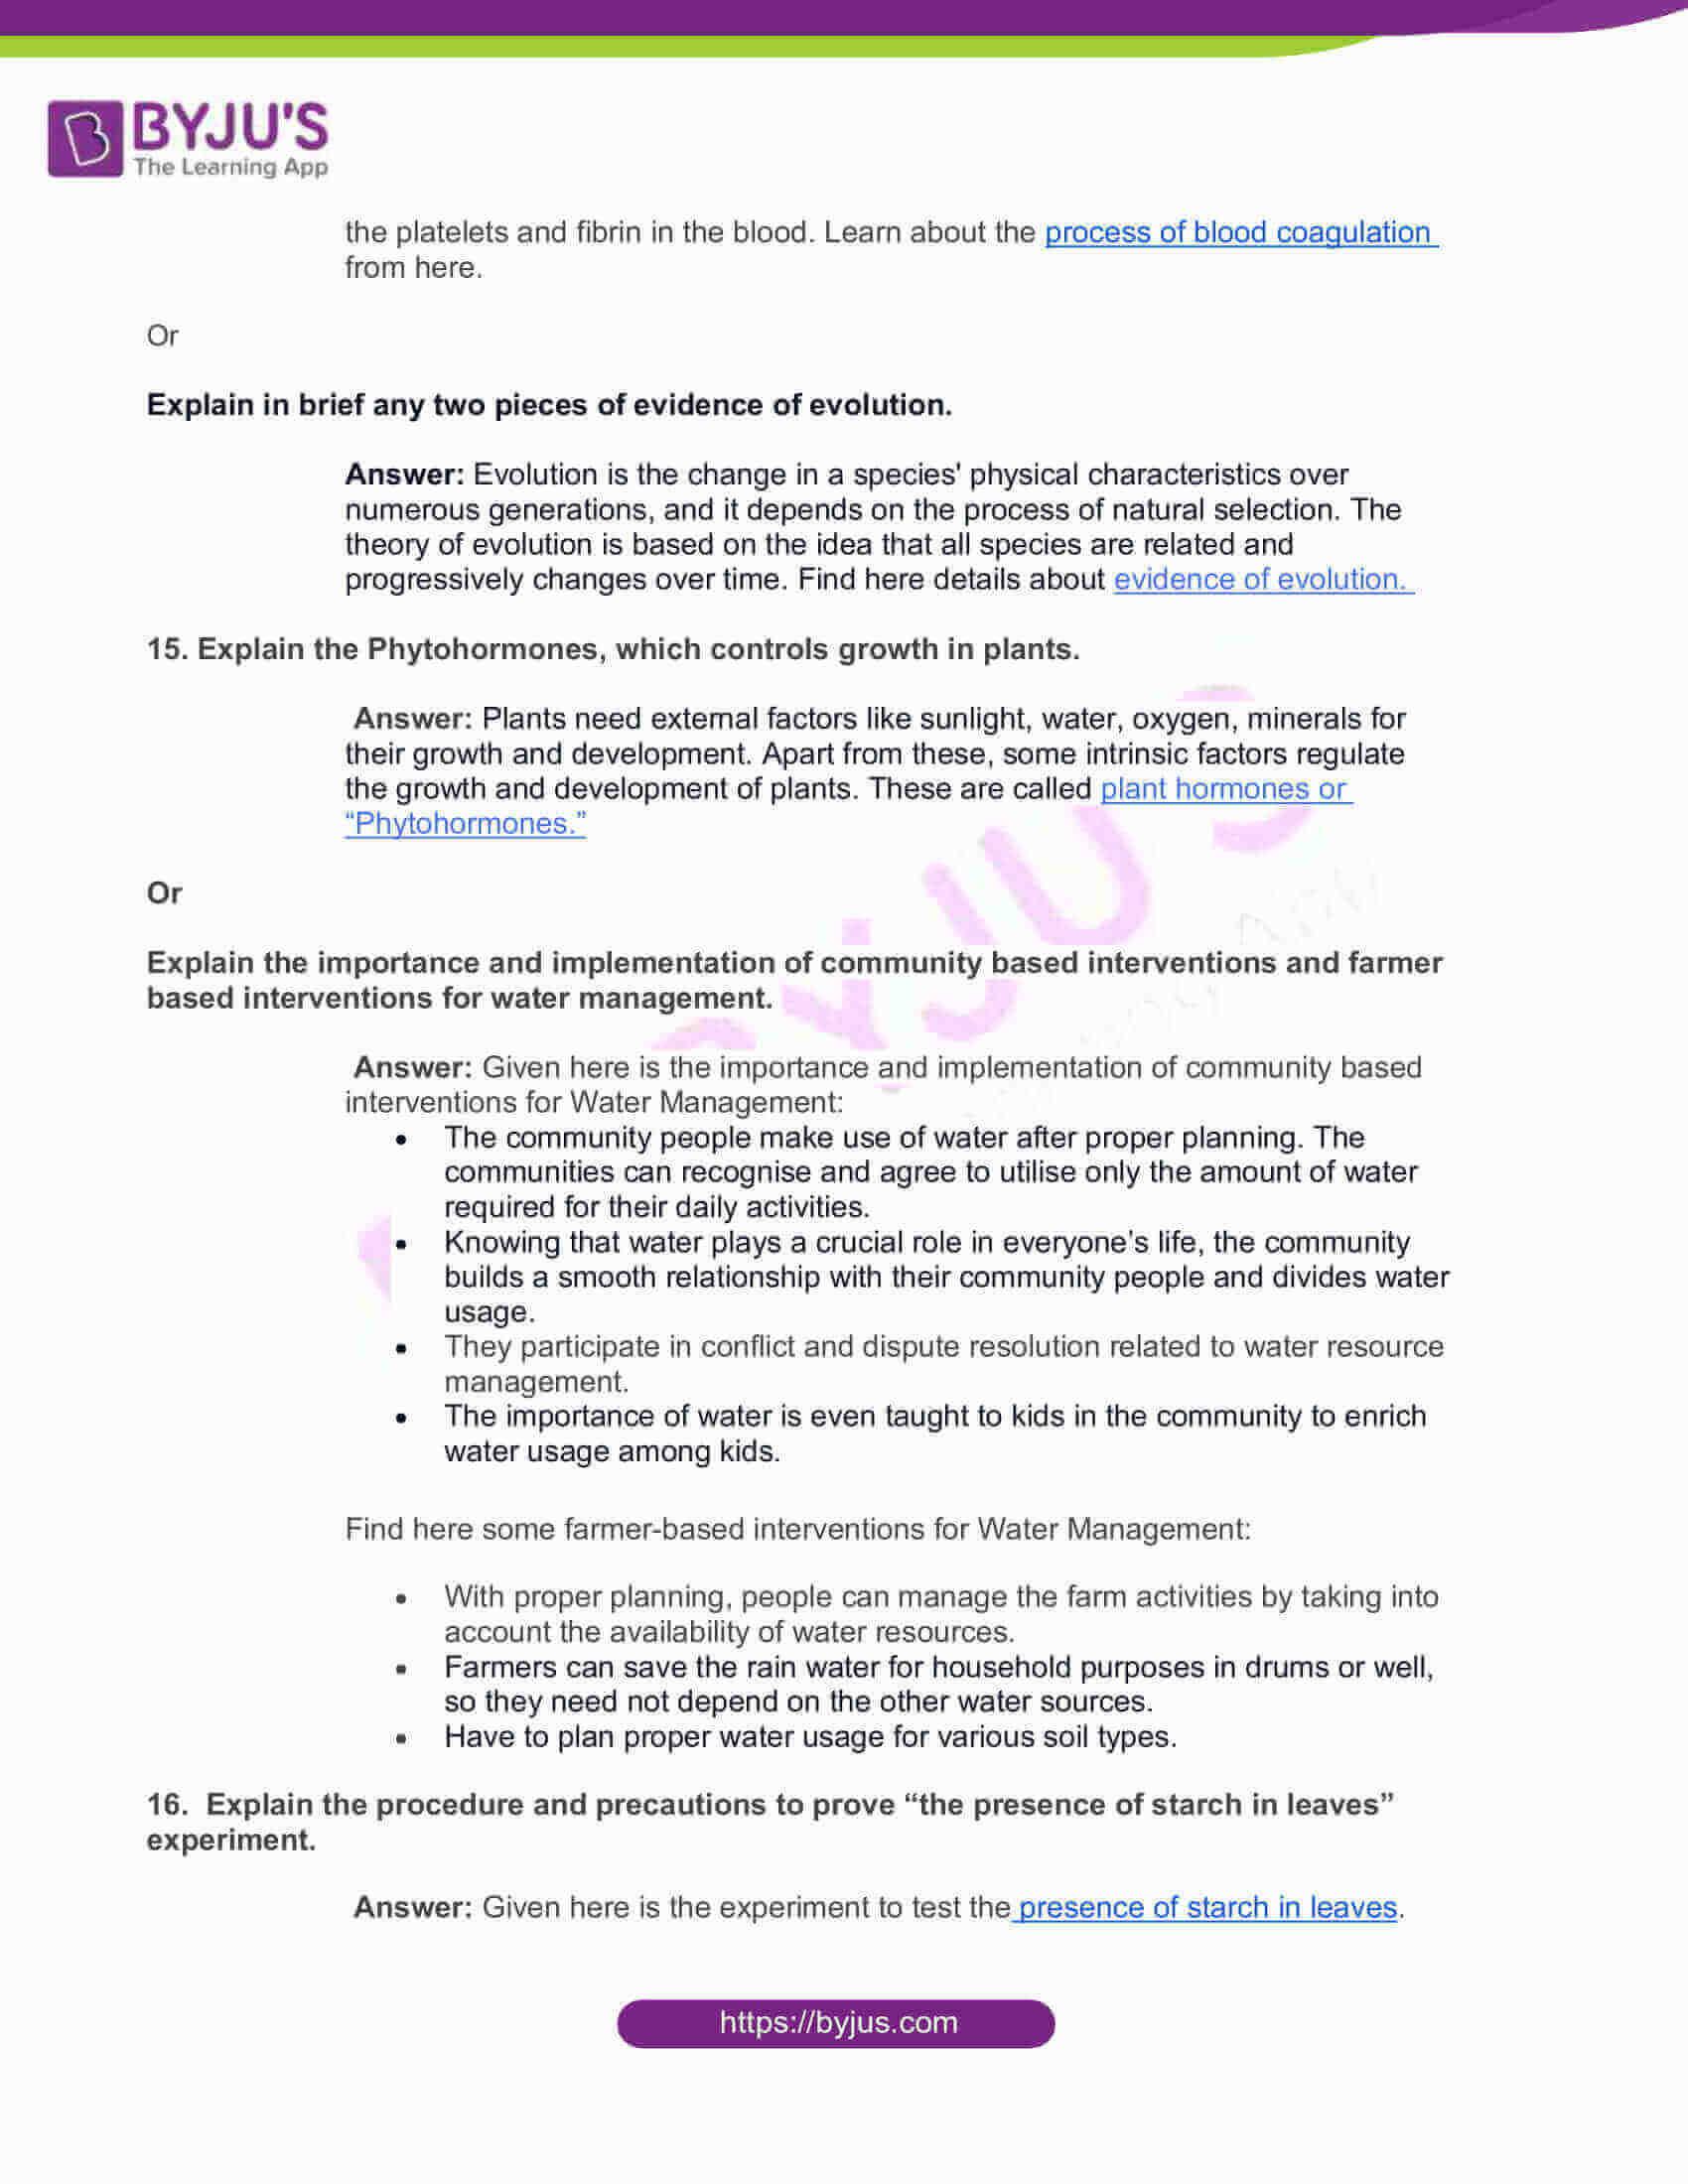 telangana board nov2020 class 10 science part ii solutions 2019 4